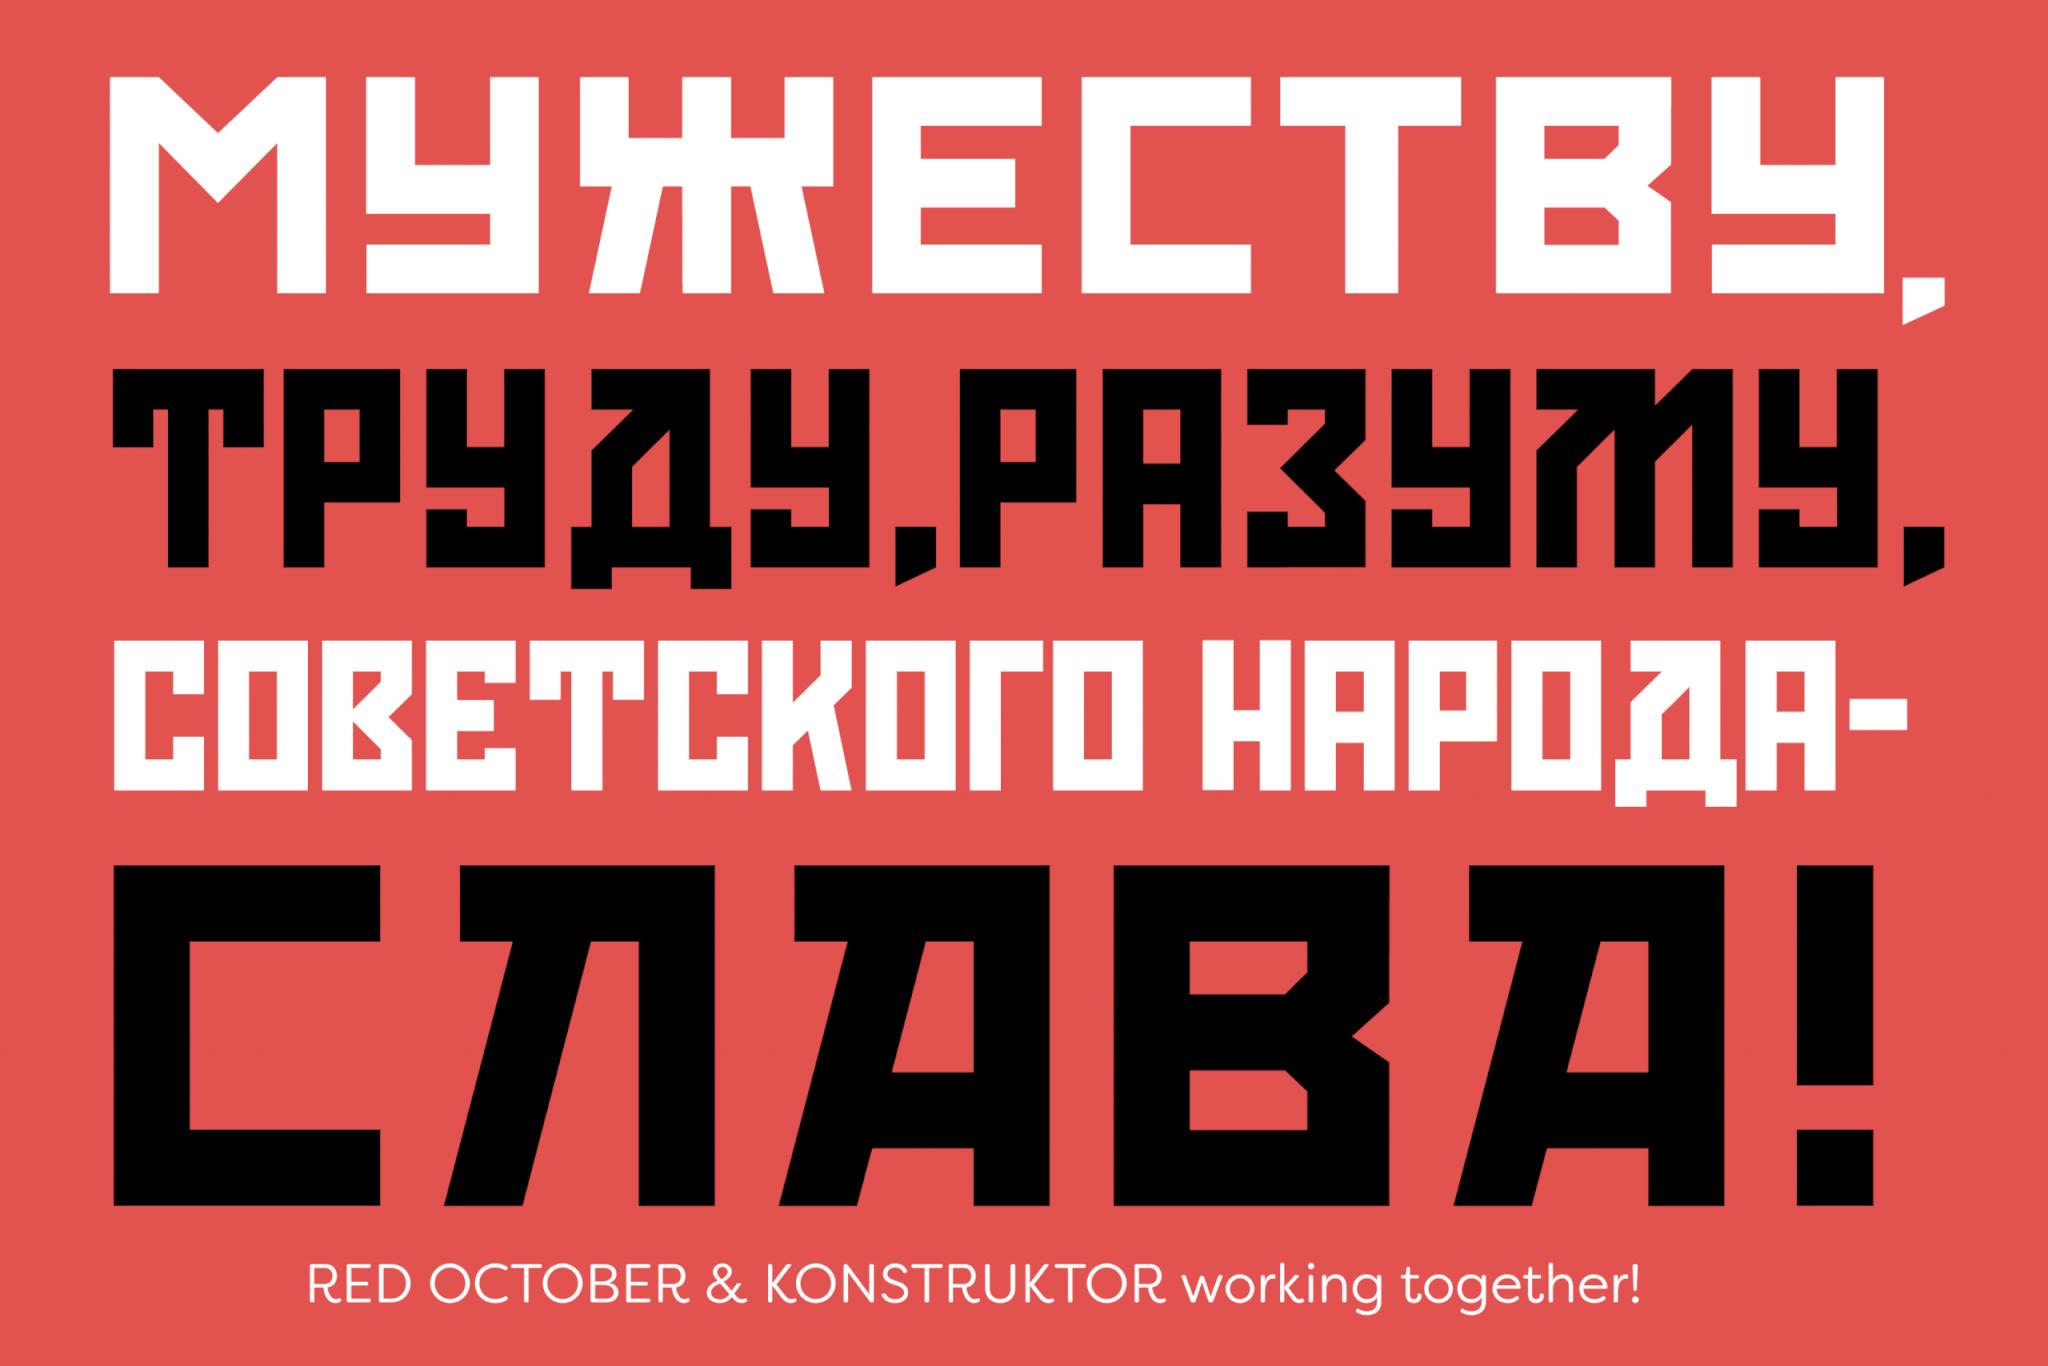 Konstruktor and Red October Sample